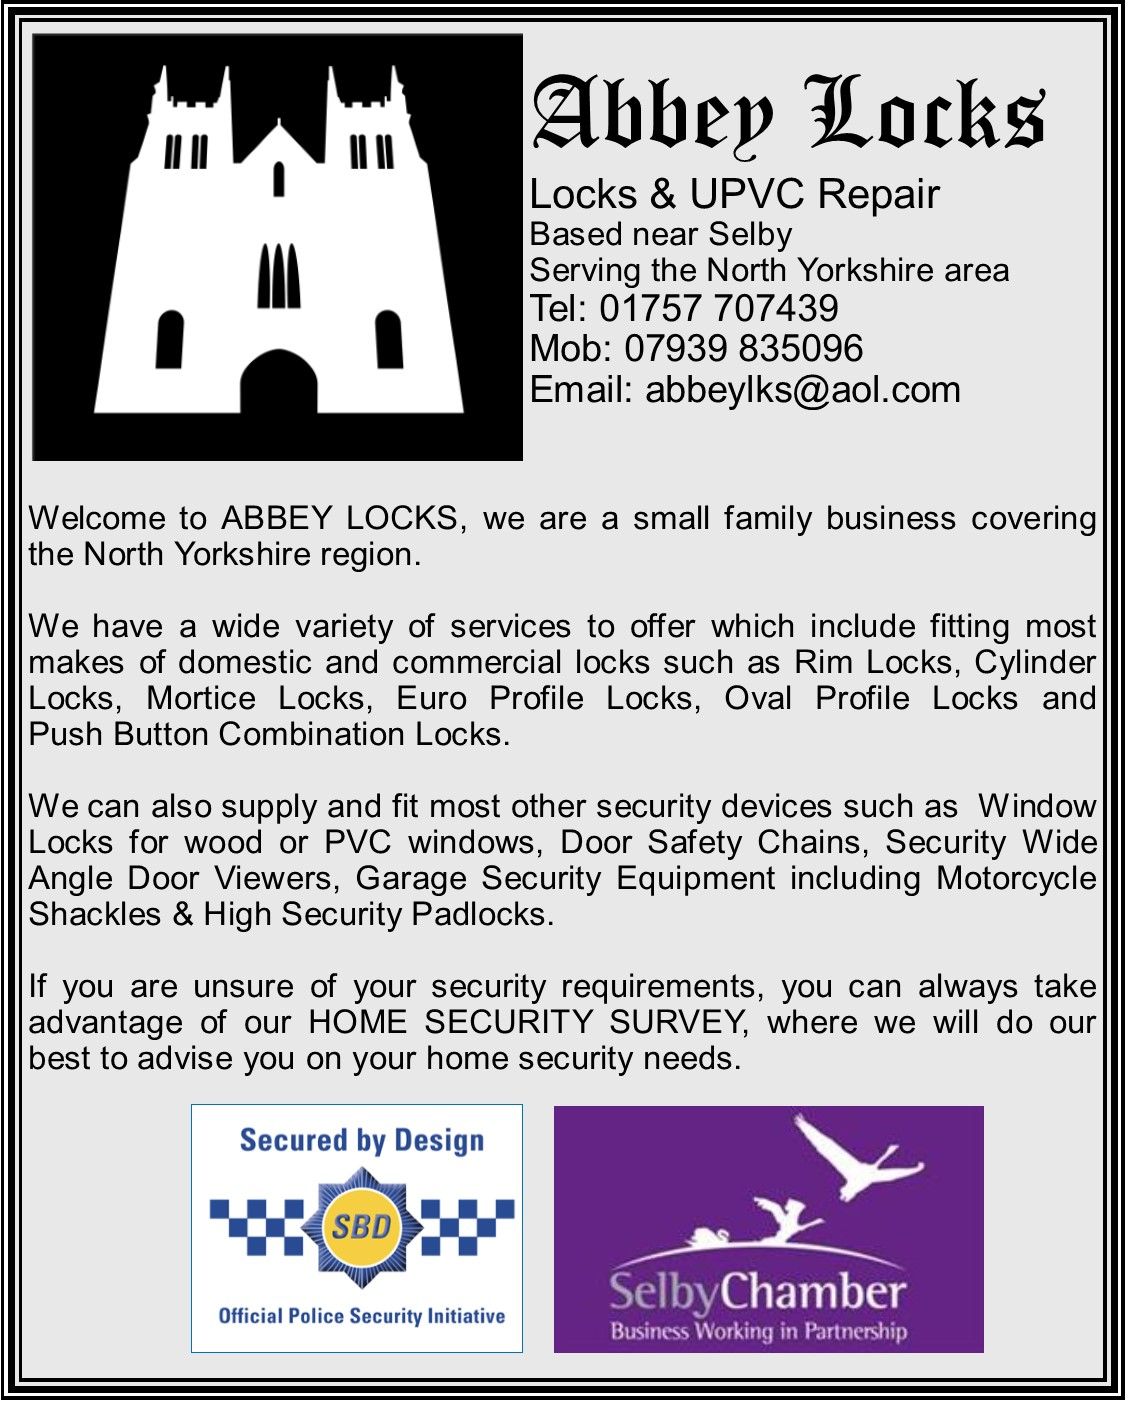 Abbey Locks